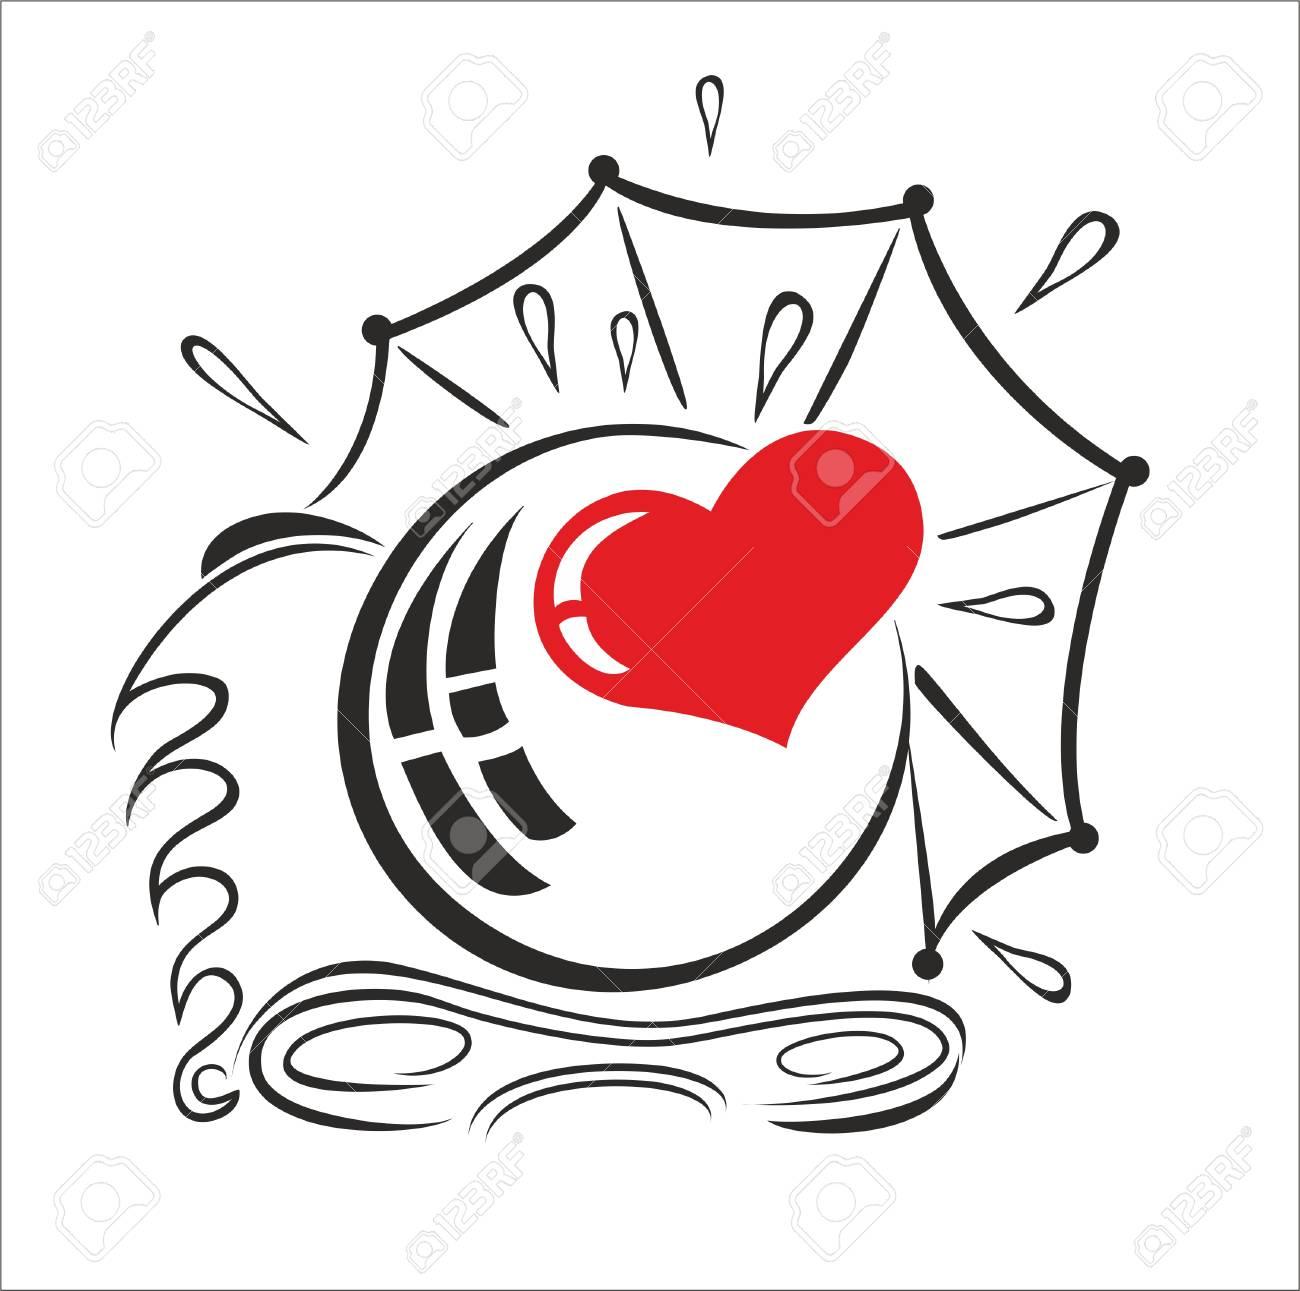 Heart Camera Vector Illustration Royalty Free Cliparts Vectors And